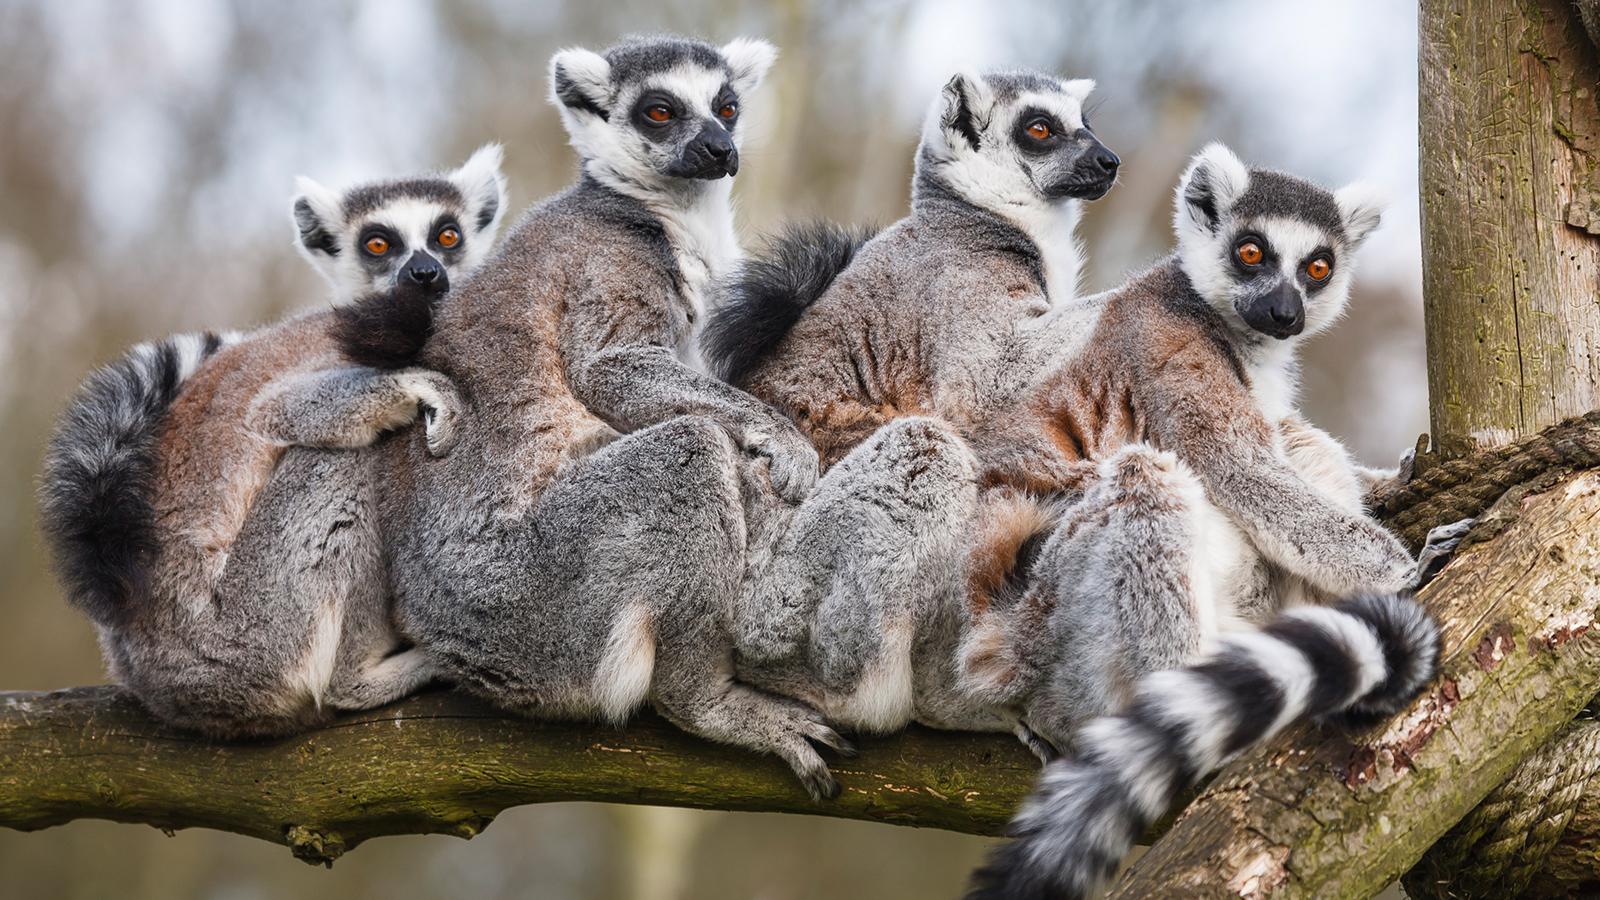 Lemur Backgrounds on Wallpapers Vista